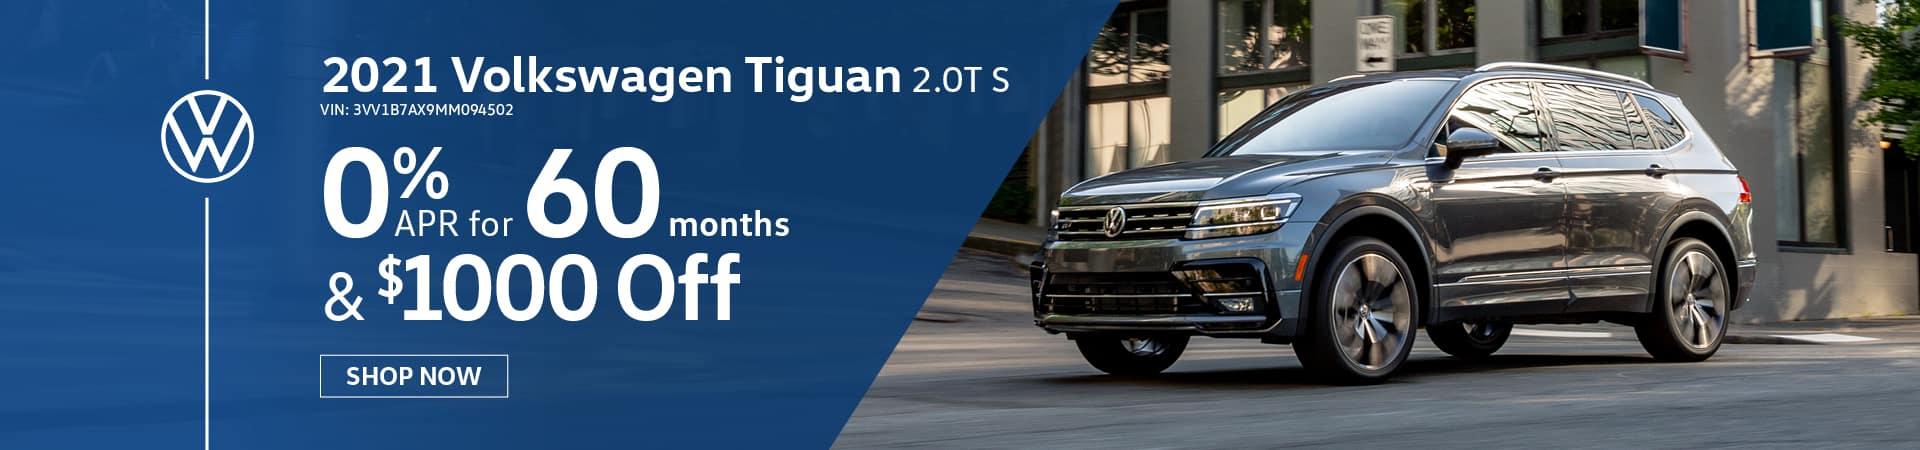 Volkswagen-Mobile-2021-06-Homepage-Banners2